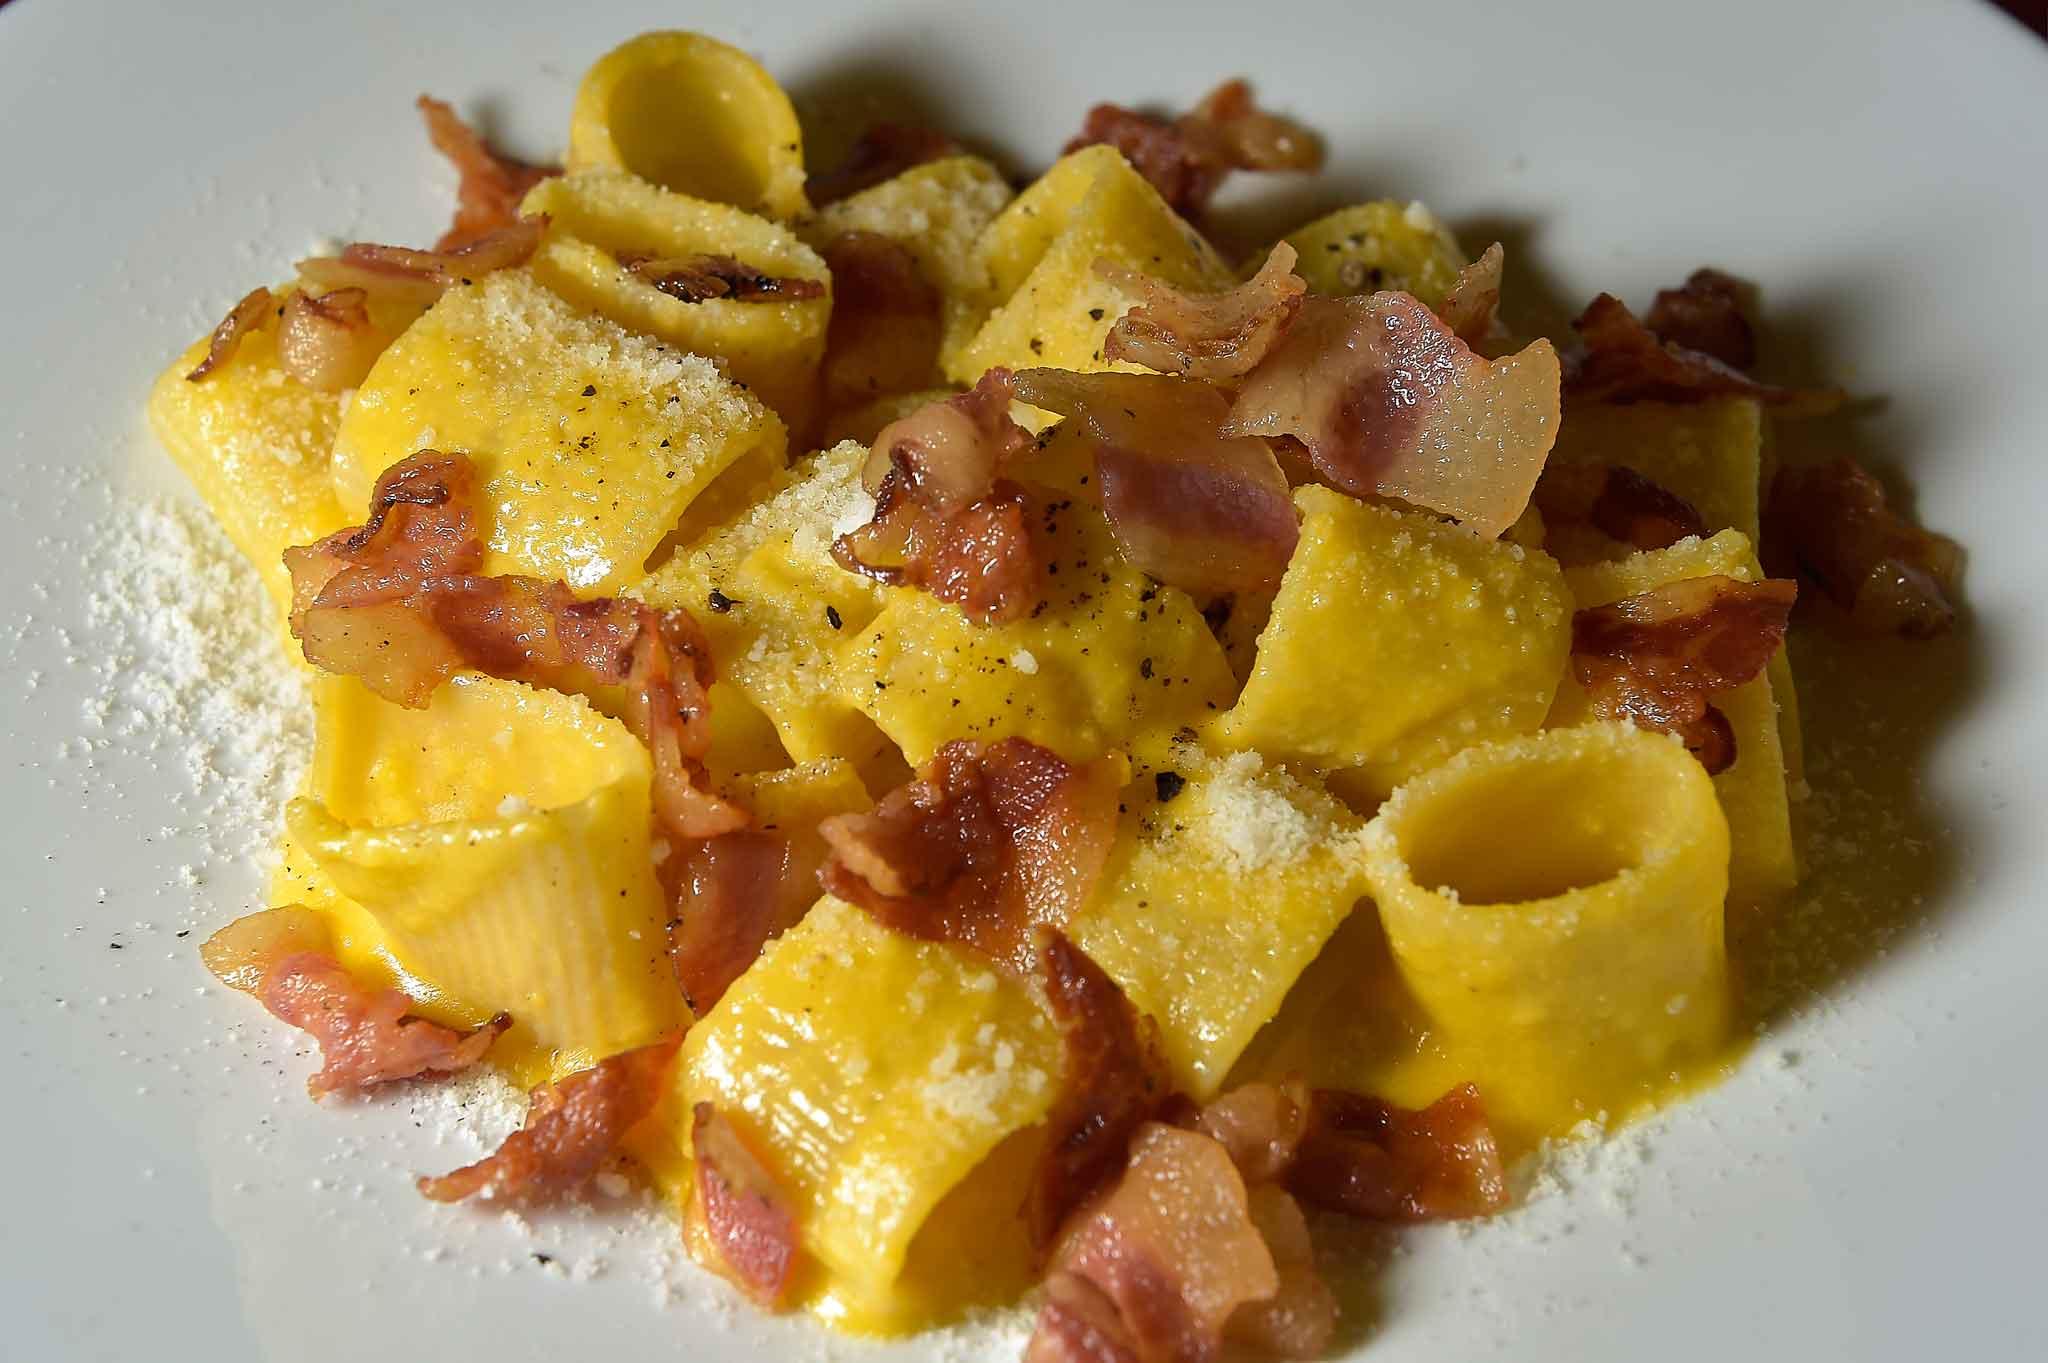 Torino du cesari per mangiare la vera cucina romana a for Antipasti cucina romana